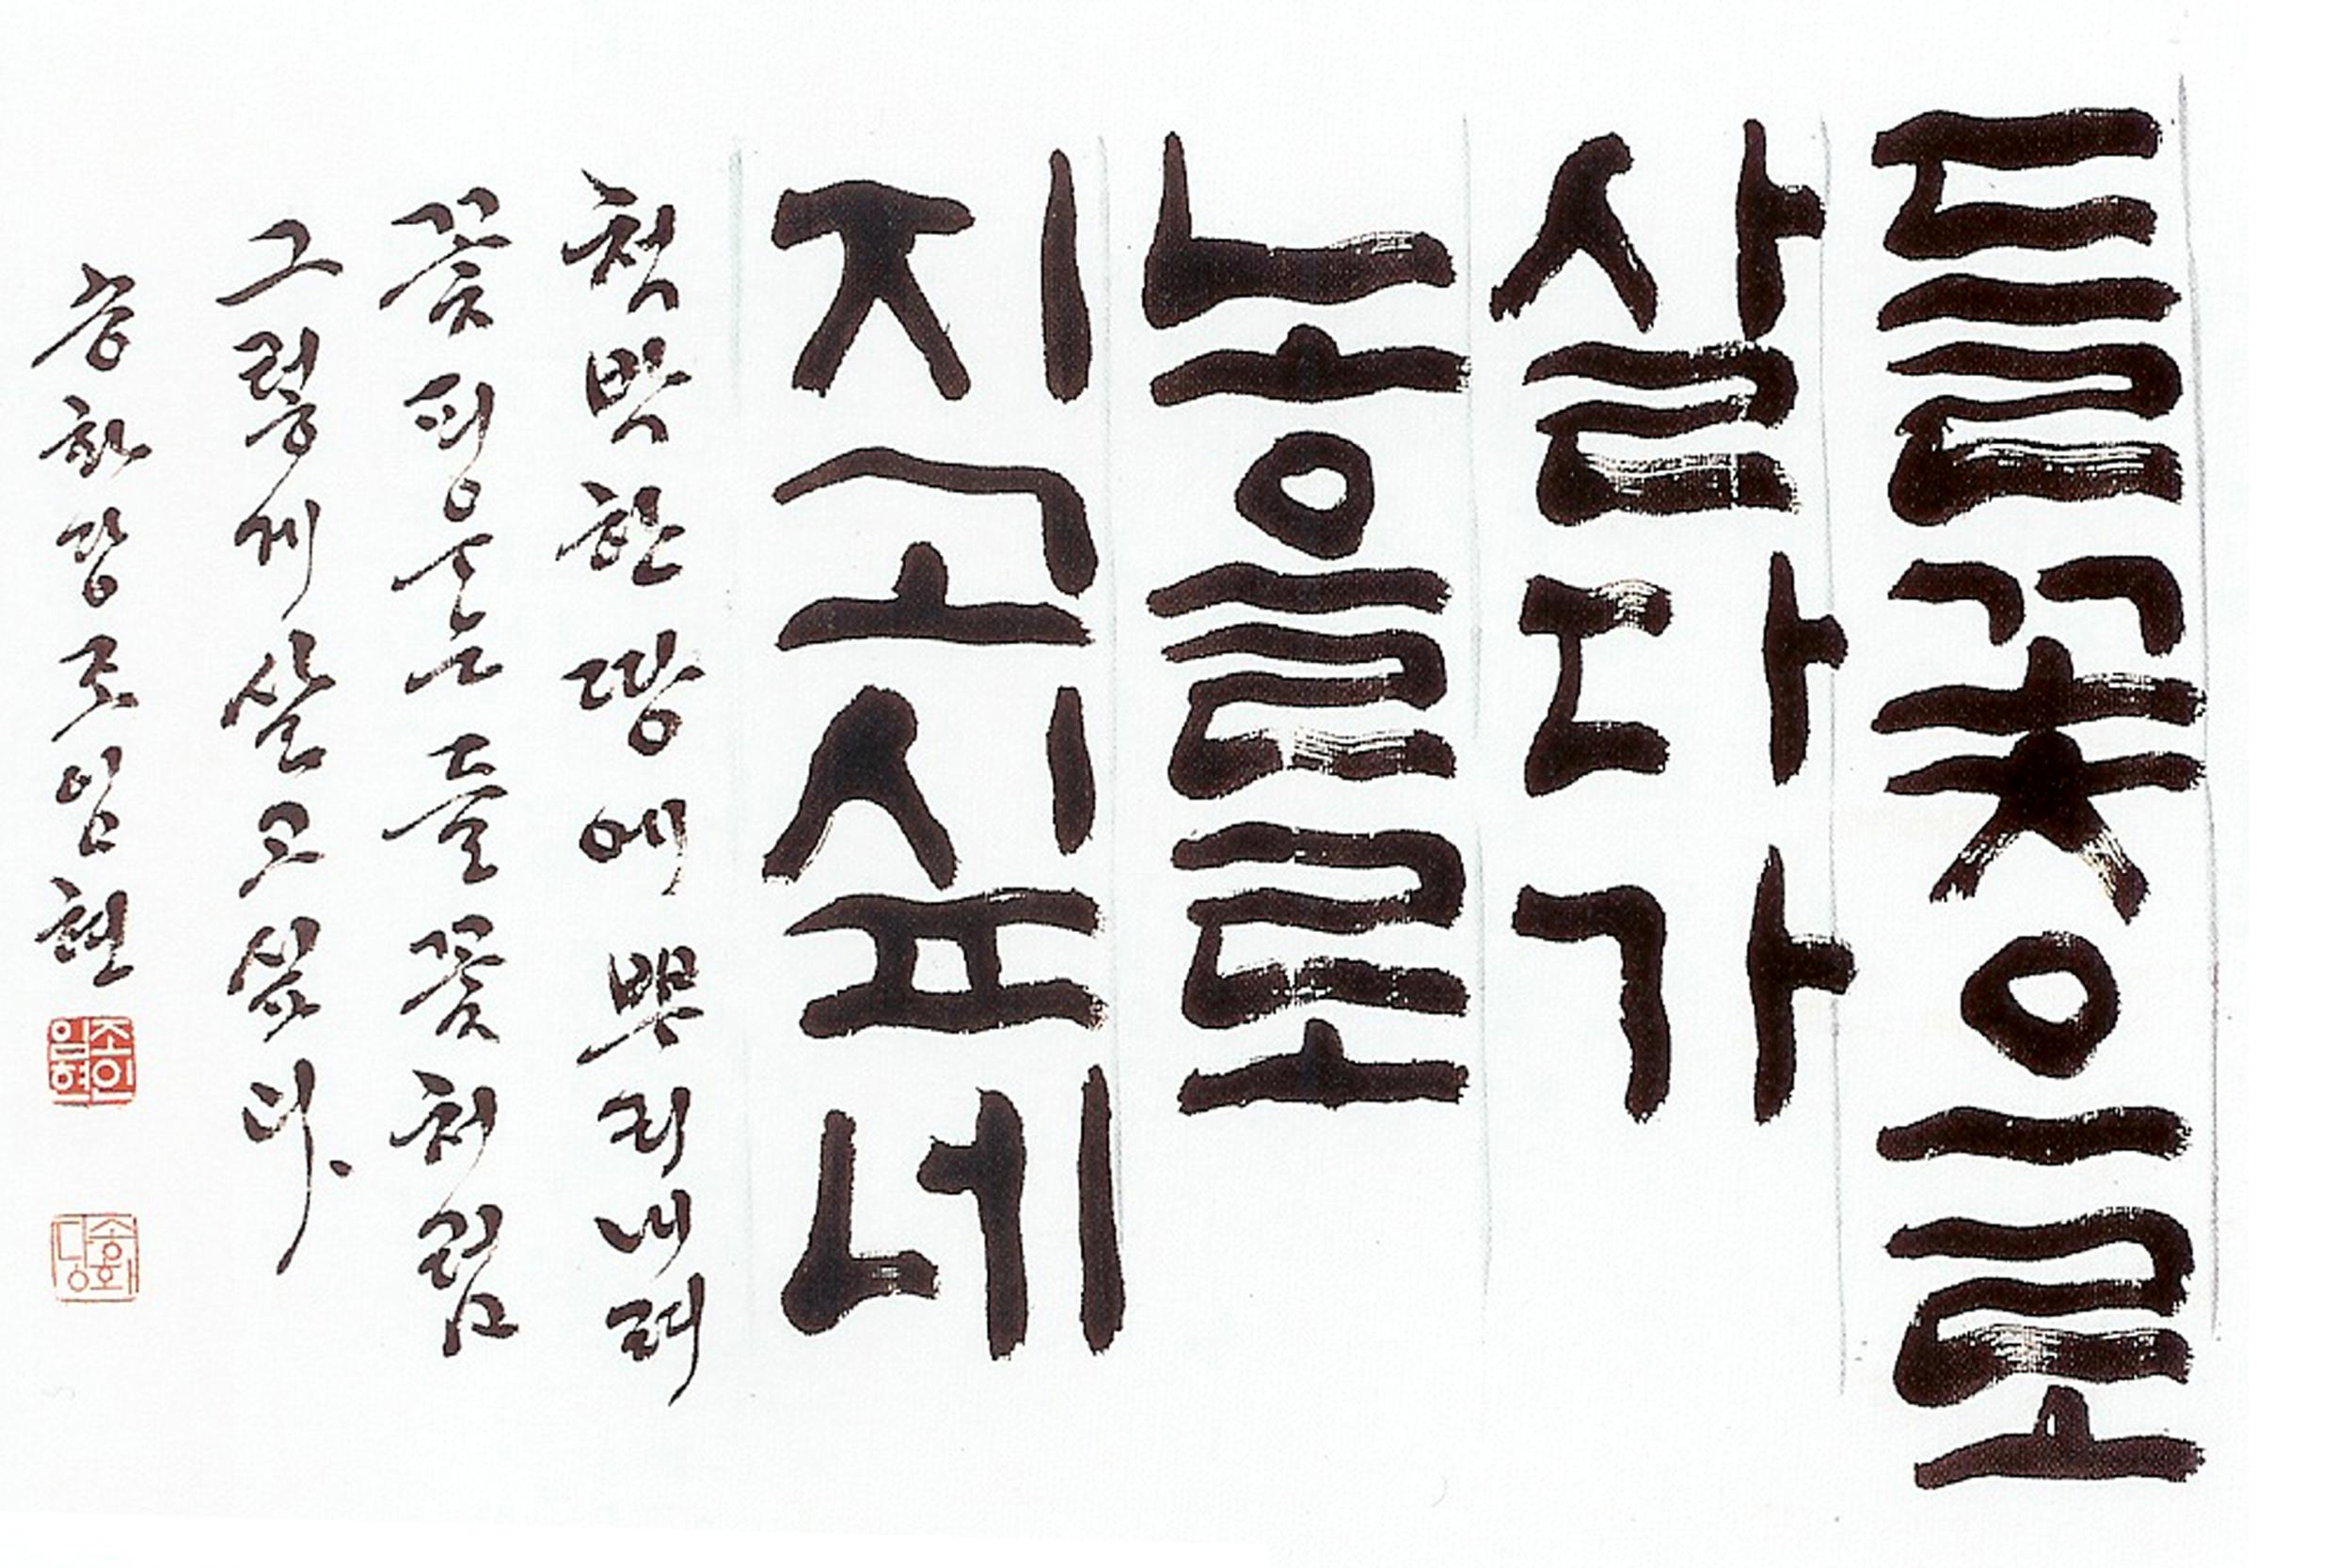 Korean calligraphy  (Photo:  Daum.net )